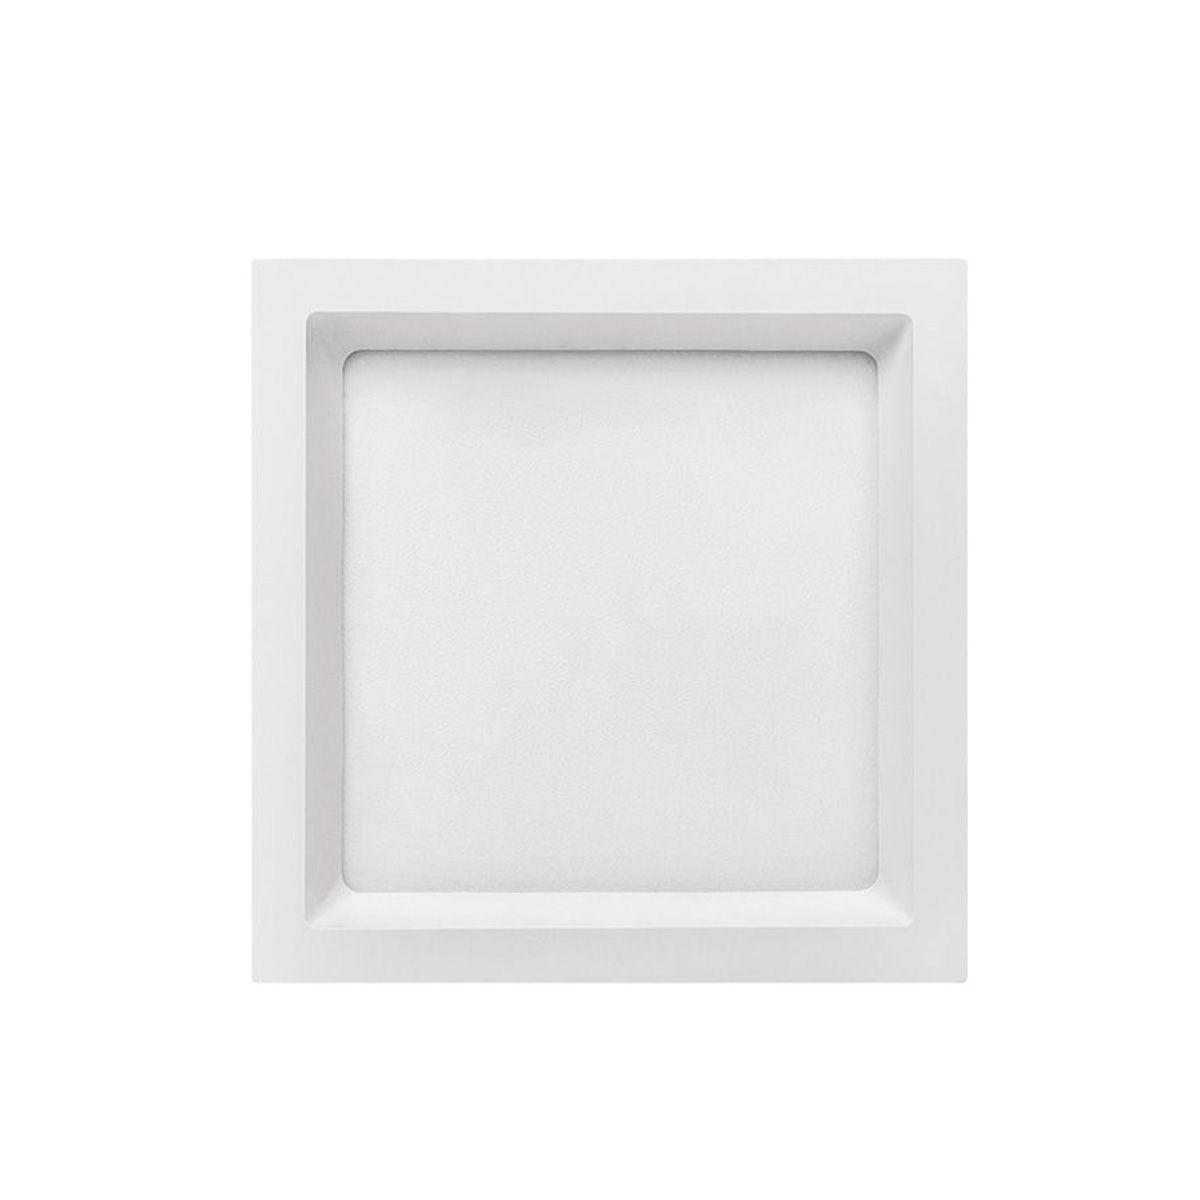 Painel Led Embutir 18w Stella Deep 20,2x20,2cm Sth8903